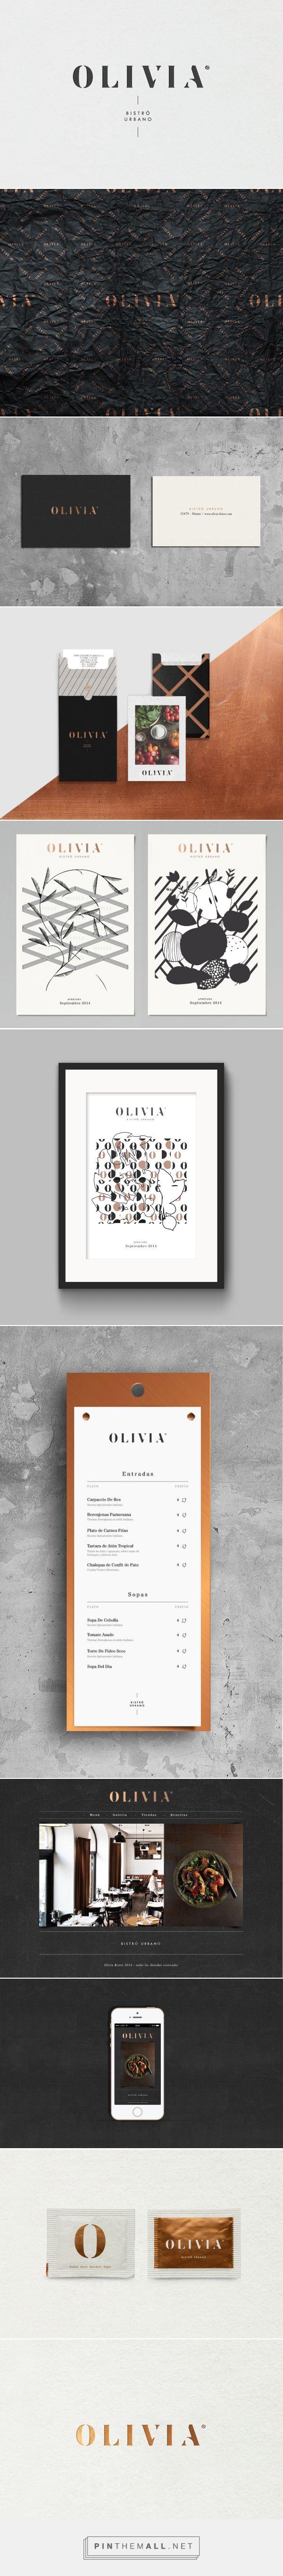 Olivia Bistro Urbano Branding on Behance | Logo Designer Bradenton, Web Design Sarasota, Tampa Fivestar Branding Agency